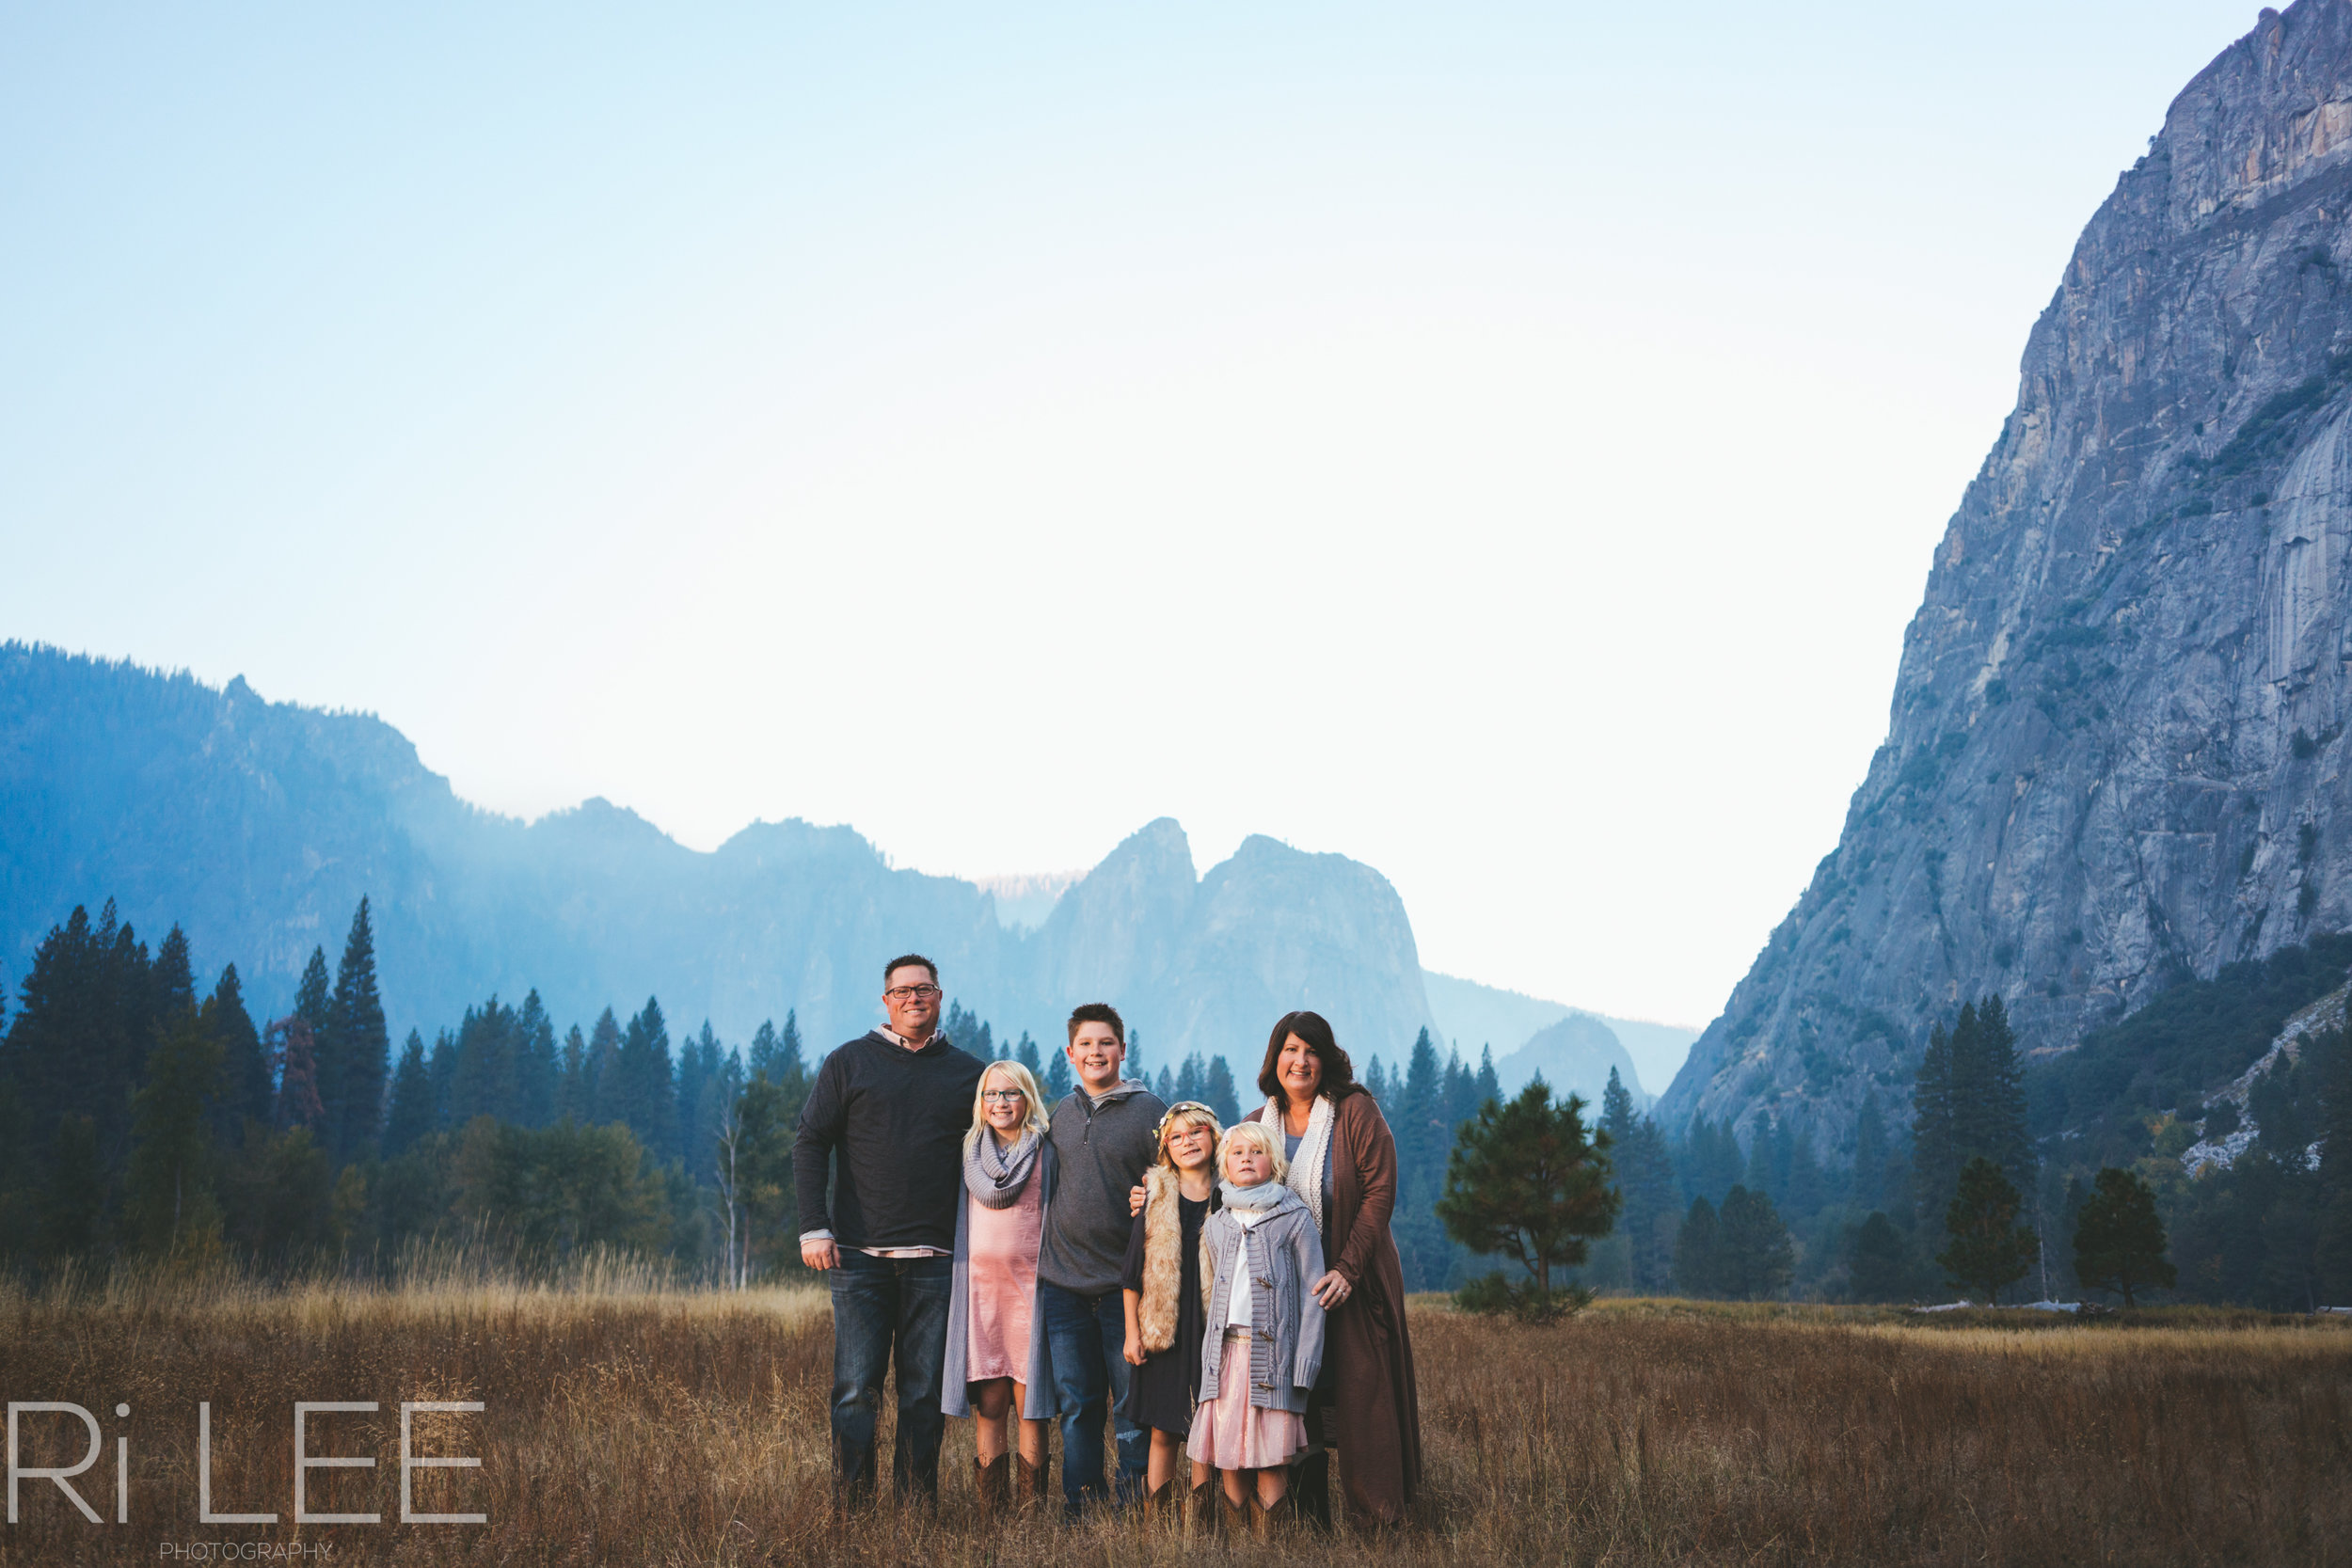 hunt-family-rilee-web (1 of 22).jpg